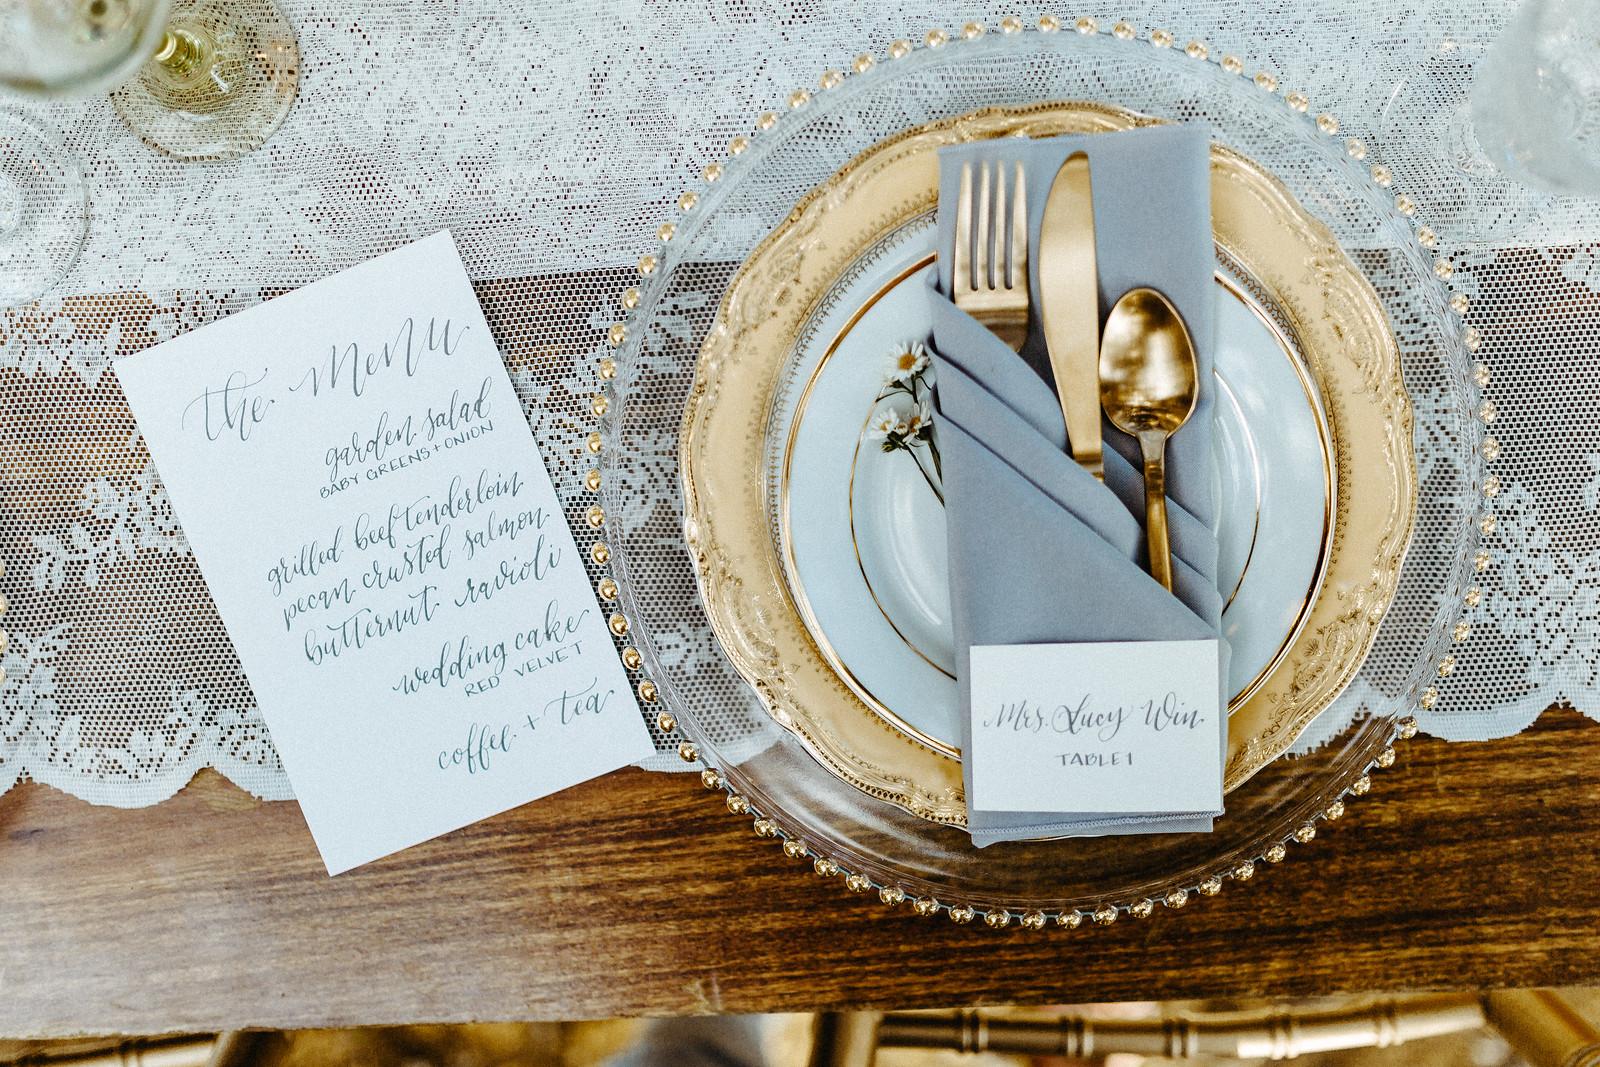 plates close up with menu.jpg